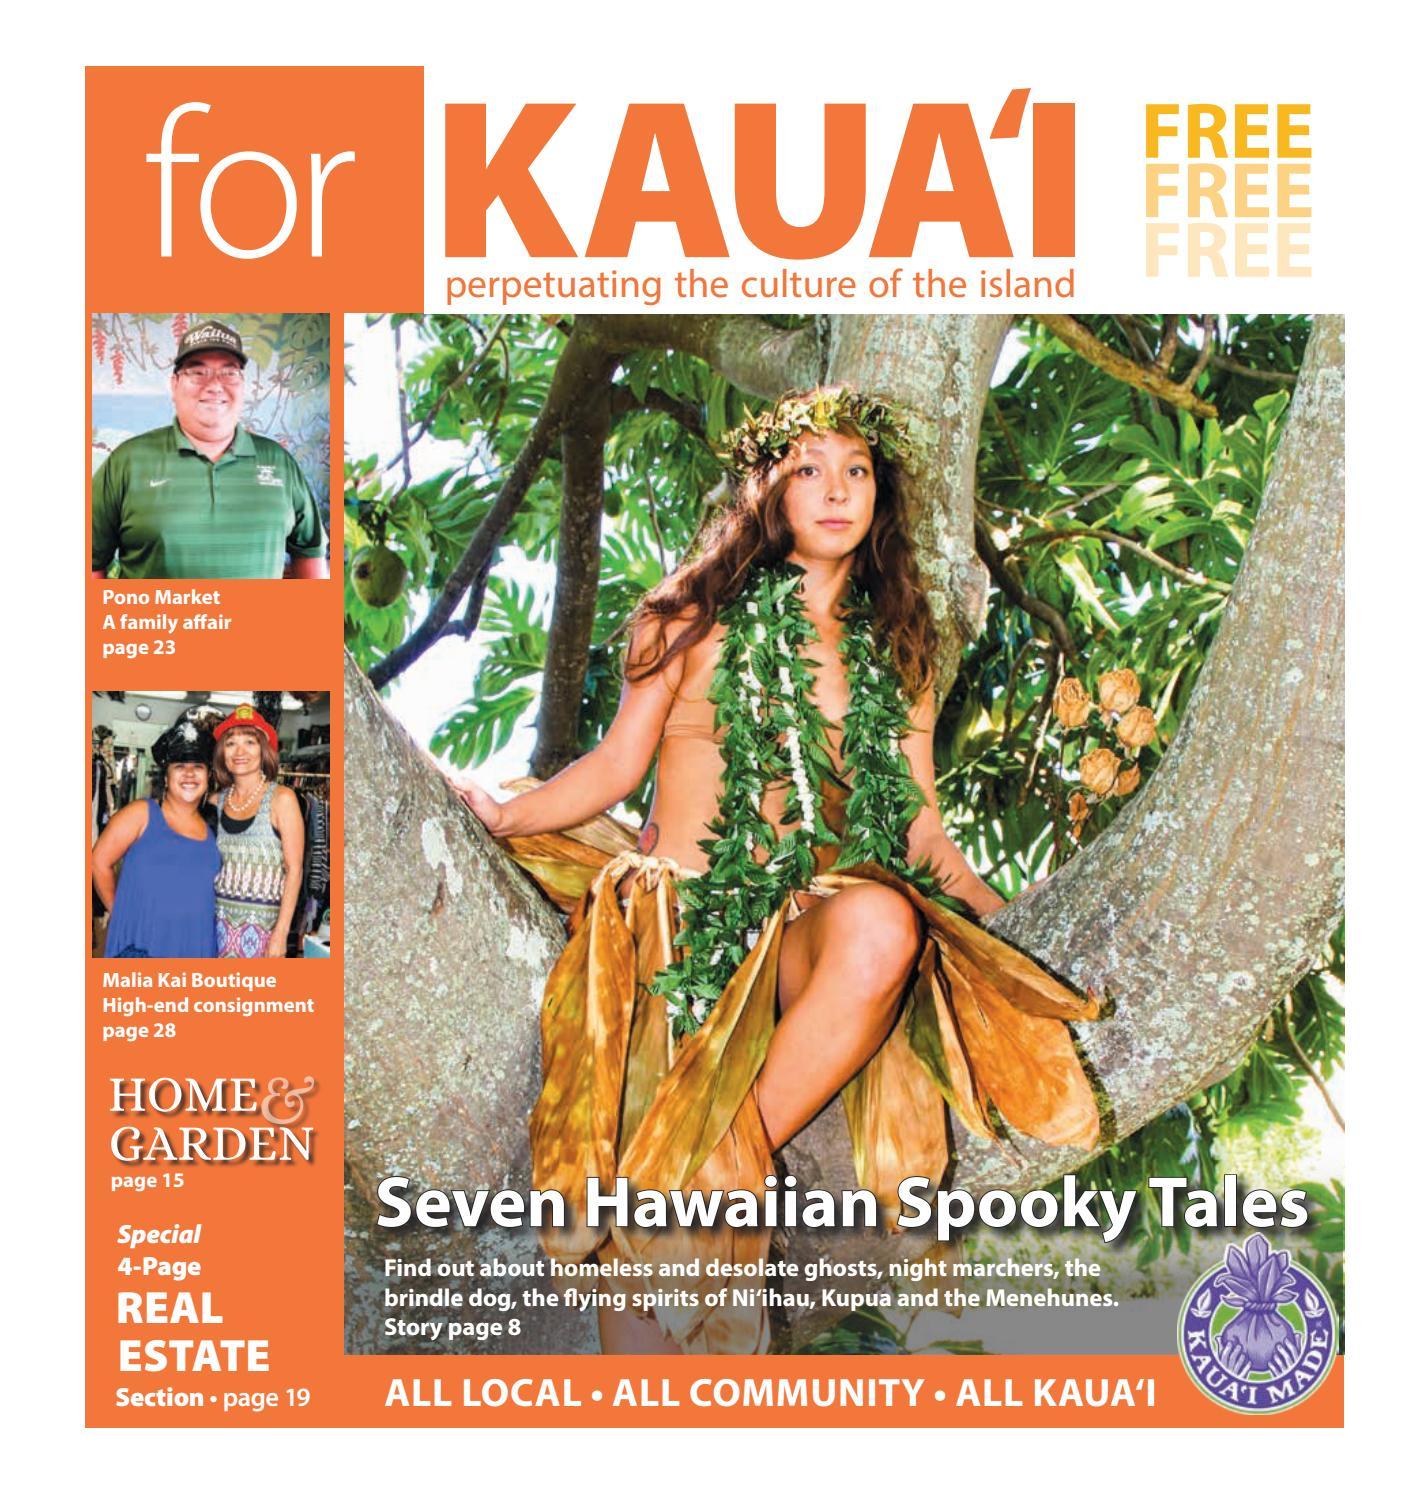 b87e8ec6710a For Kauai October 2017 by For Kauai - issuu